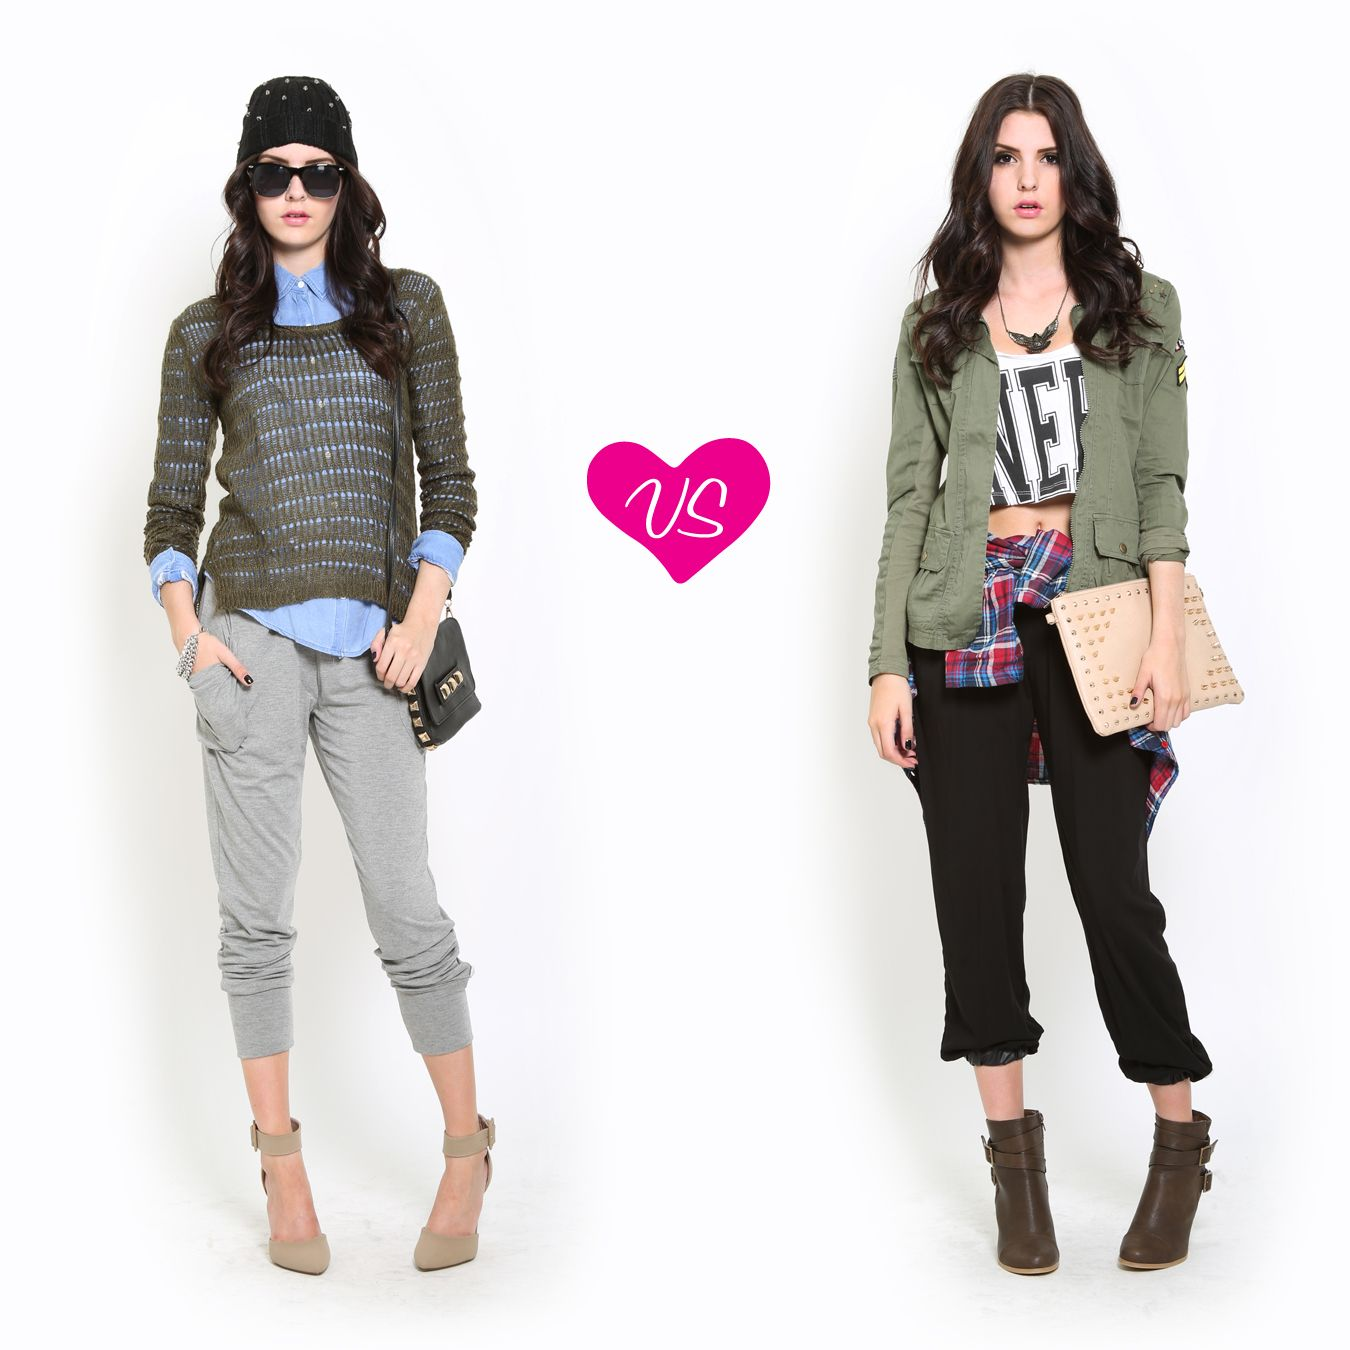 Street Style Outfit Vote Jogger Pant // Styles For Less | Jolie Joggers Ensembles | Pinterest ...